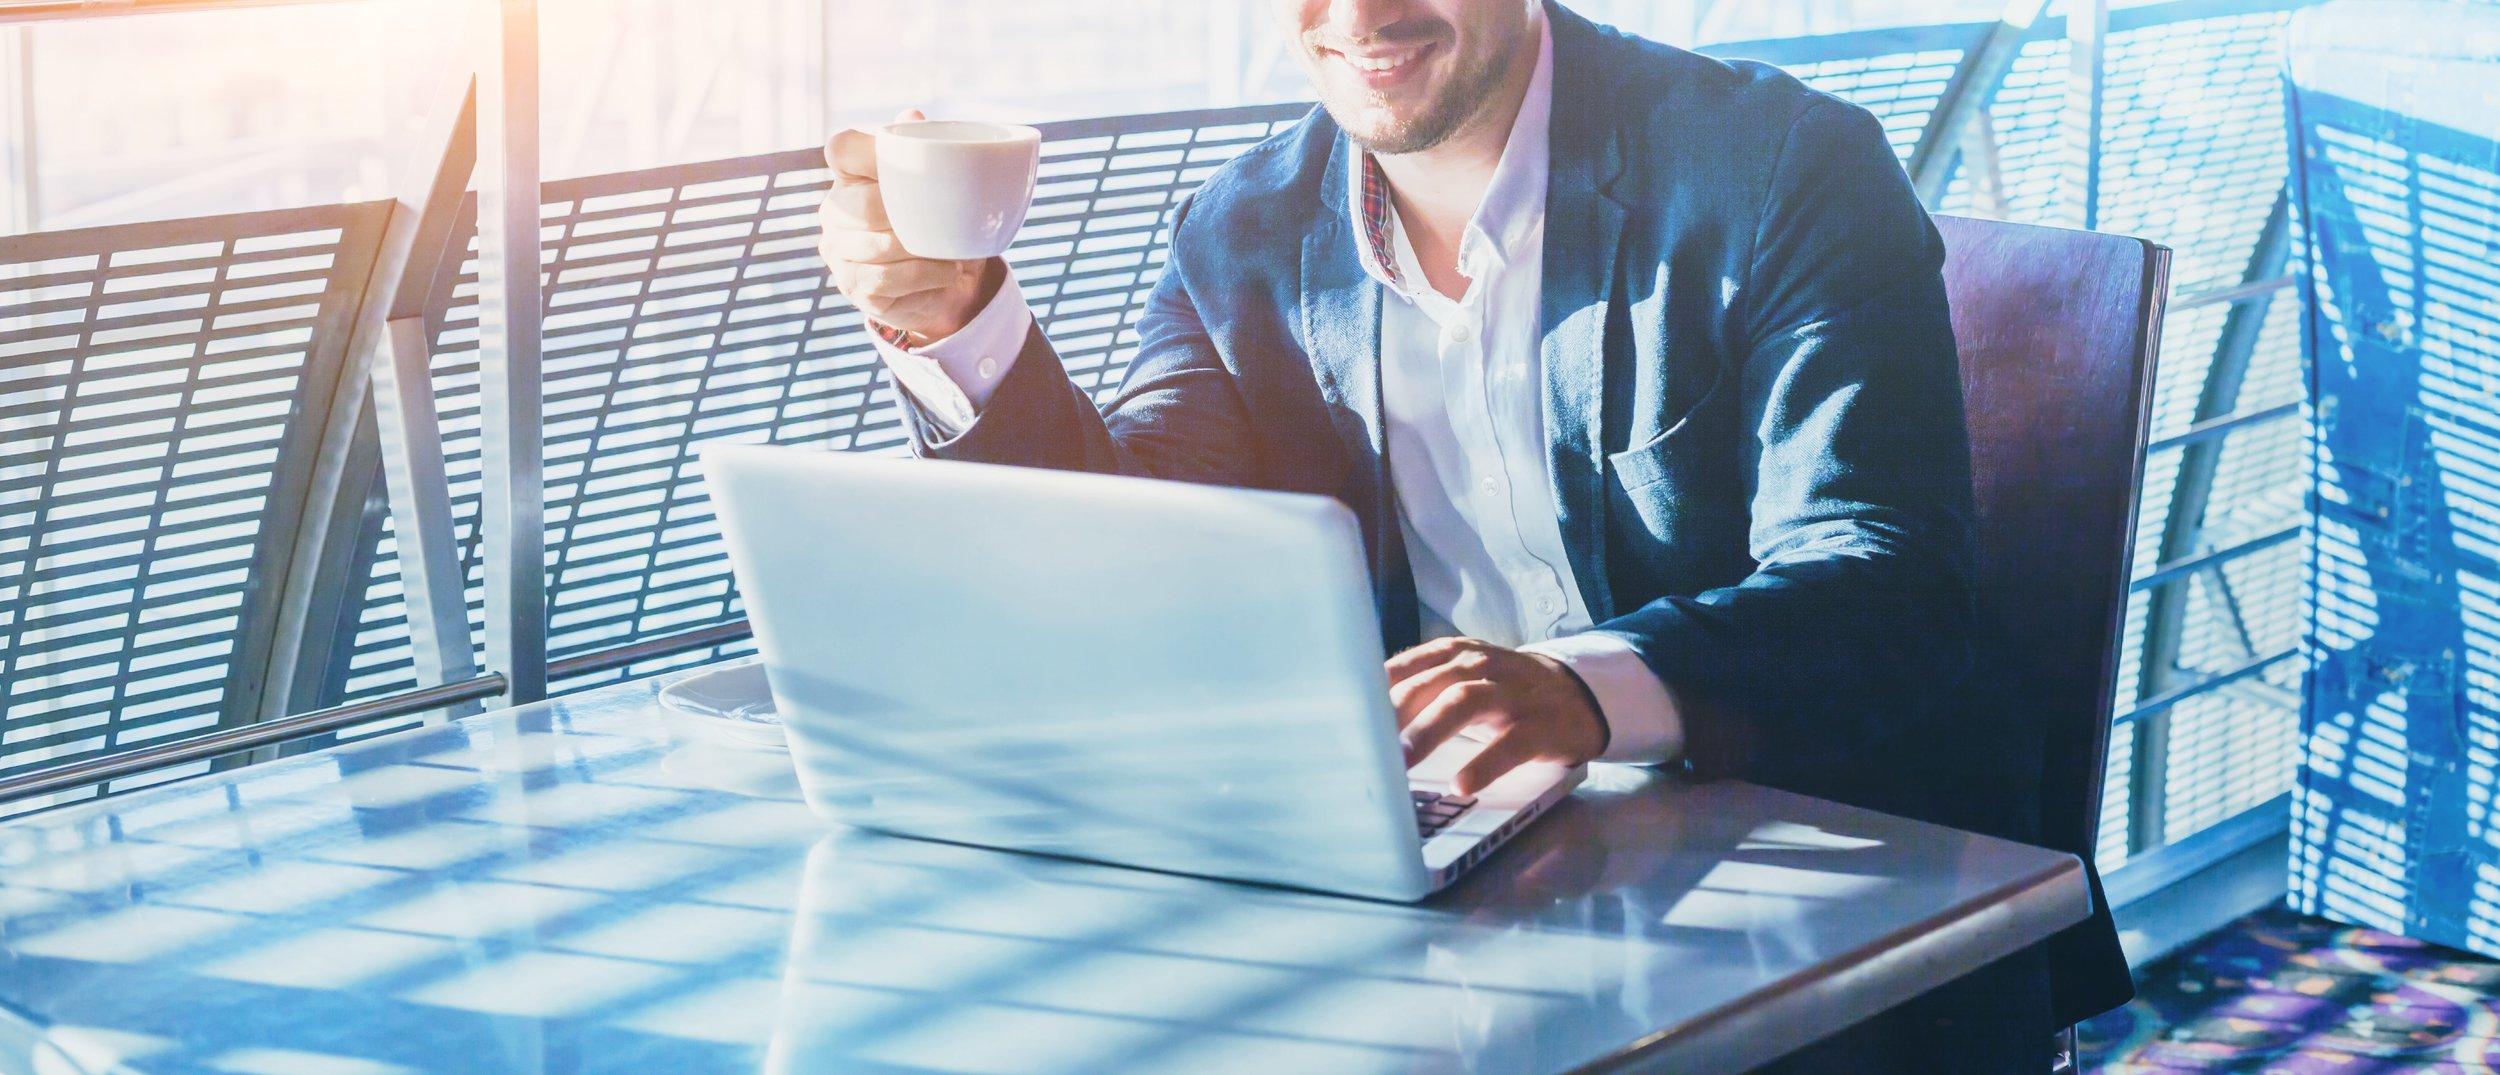 Business man on laptop video conference-min.jpg